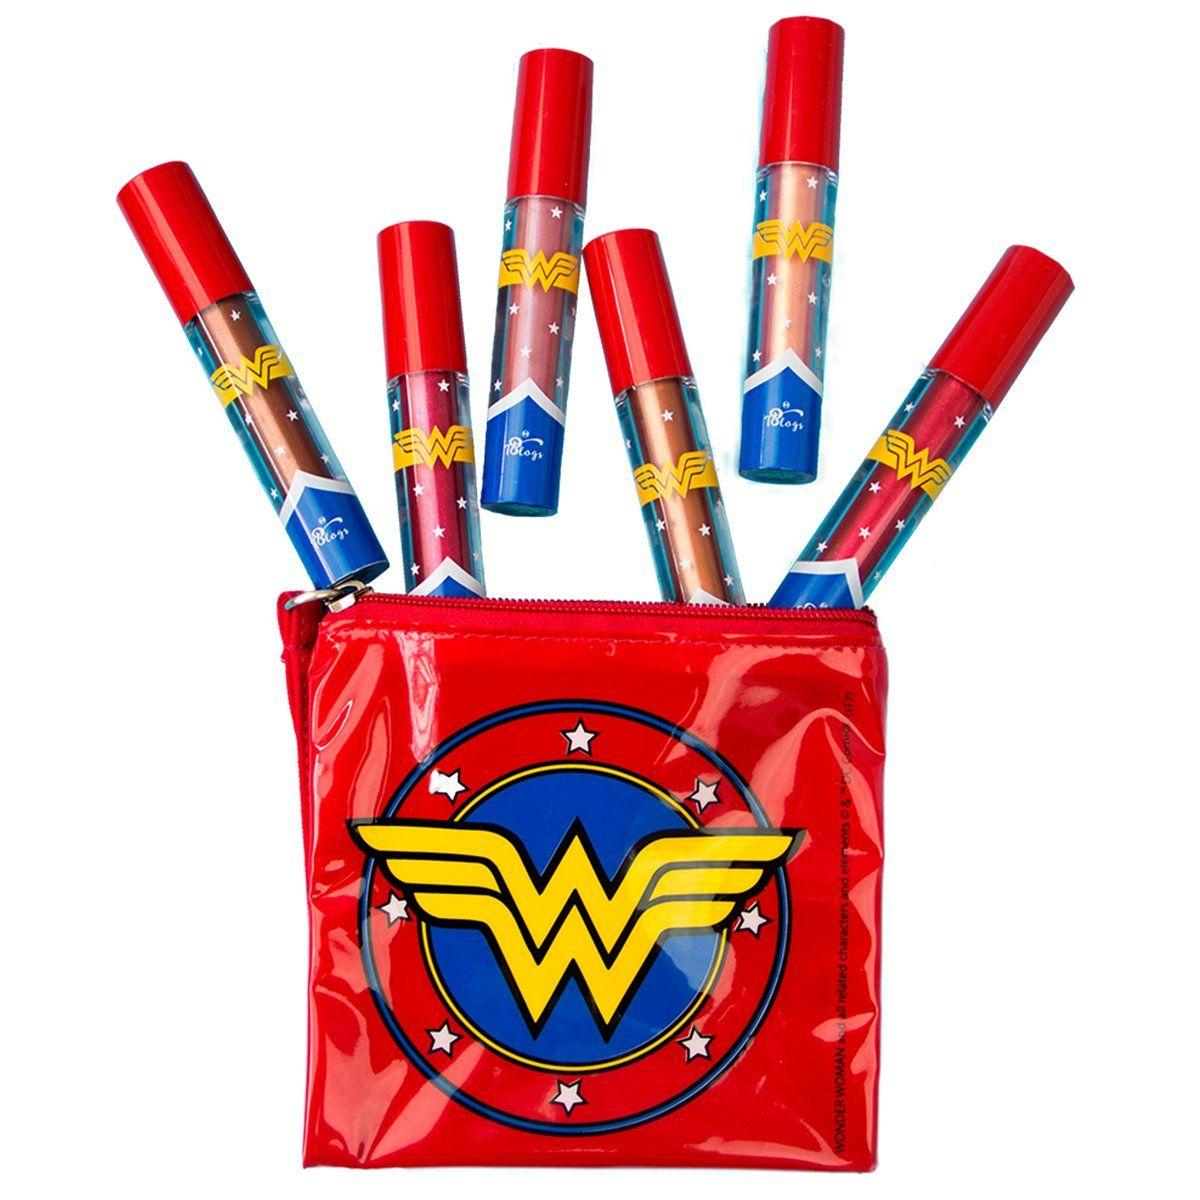 Kit Batons Mulher Maravilha Metal Power 6 cores + necessaire brinde